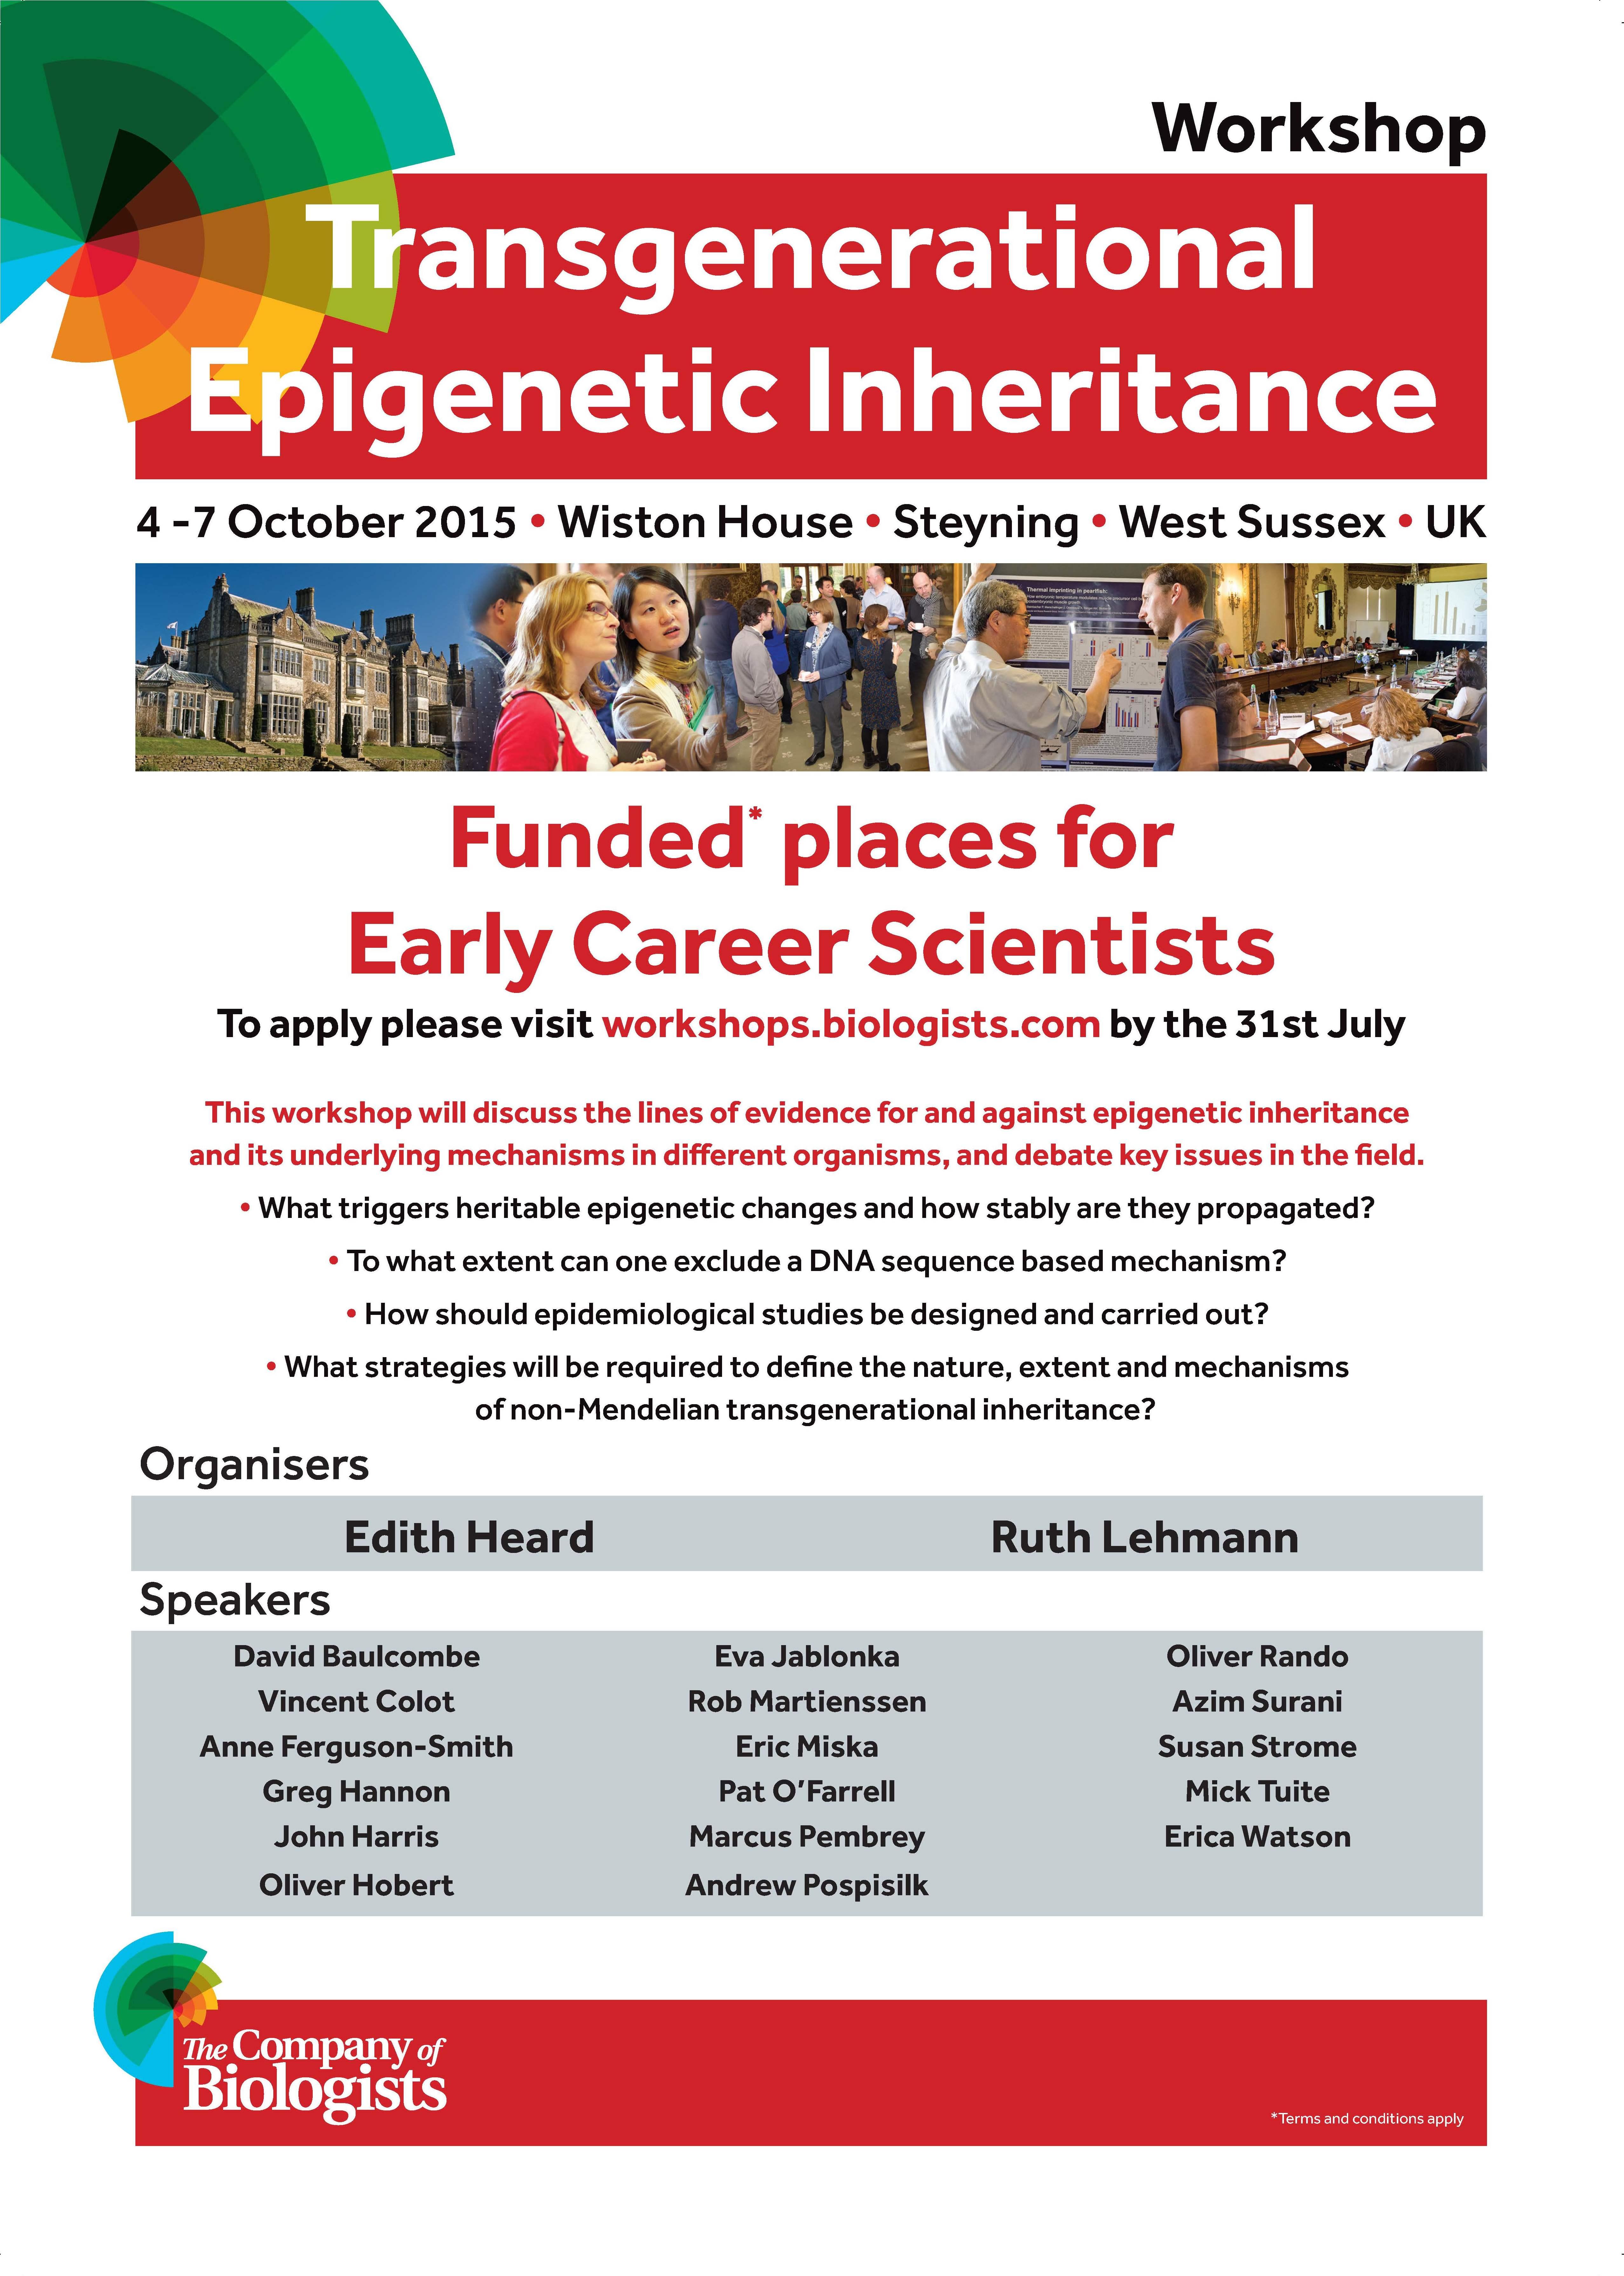 Transgenerational epigenetics workshop new poster